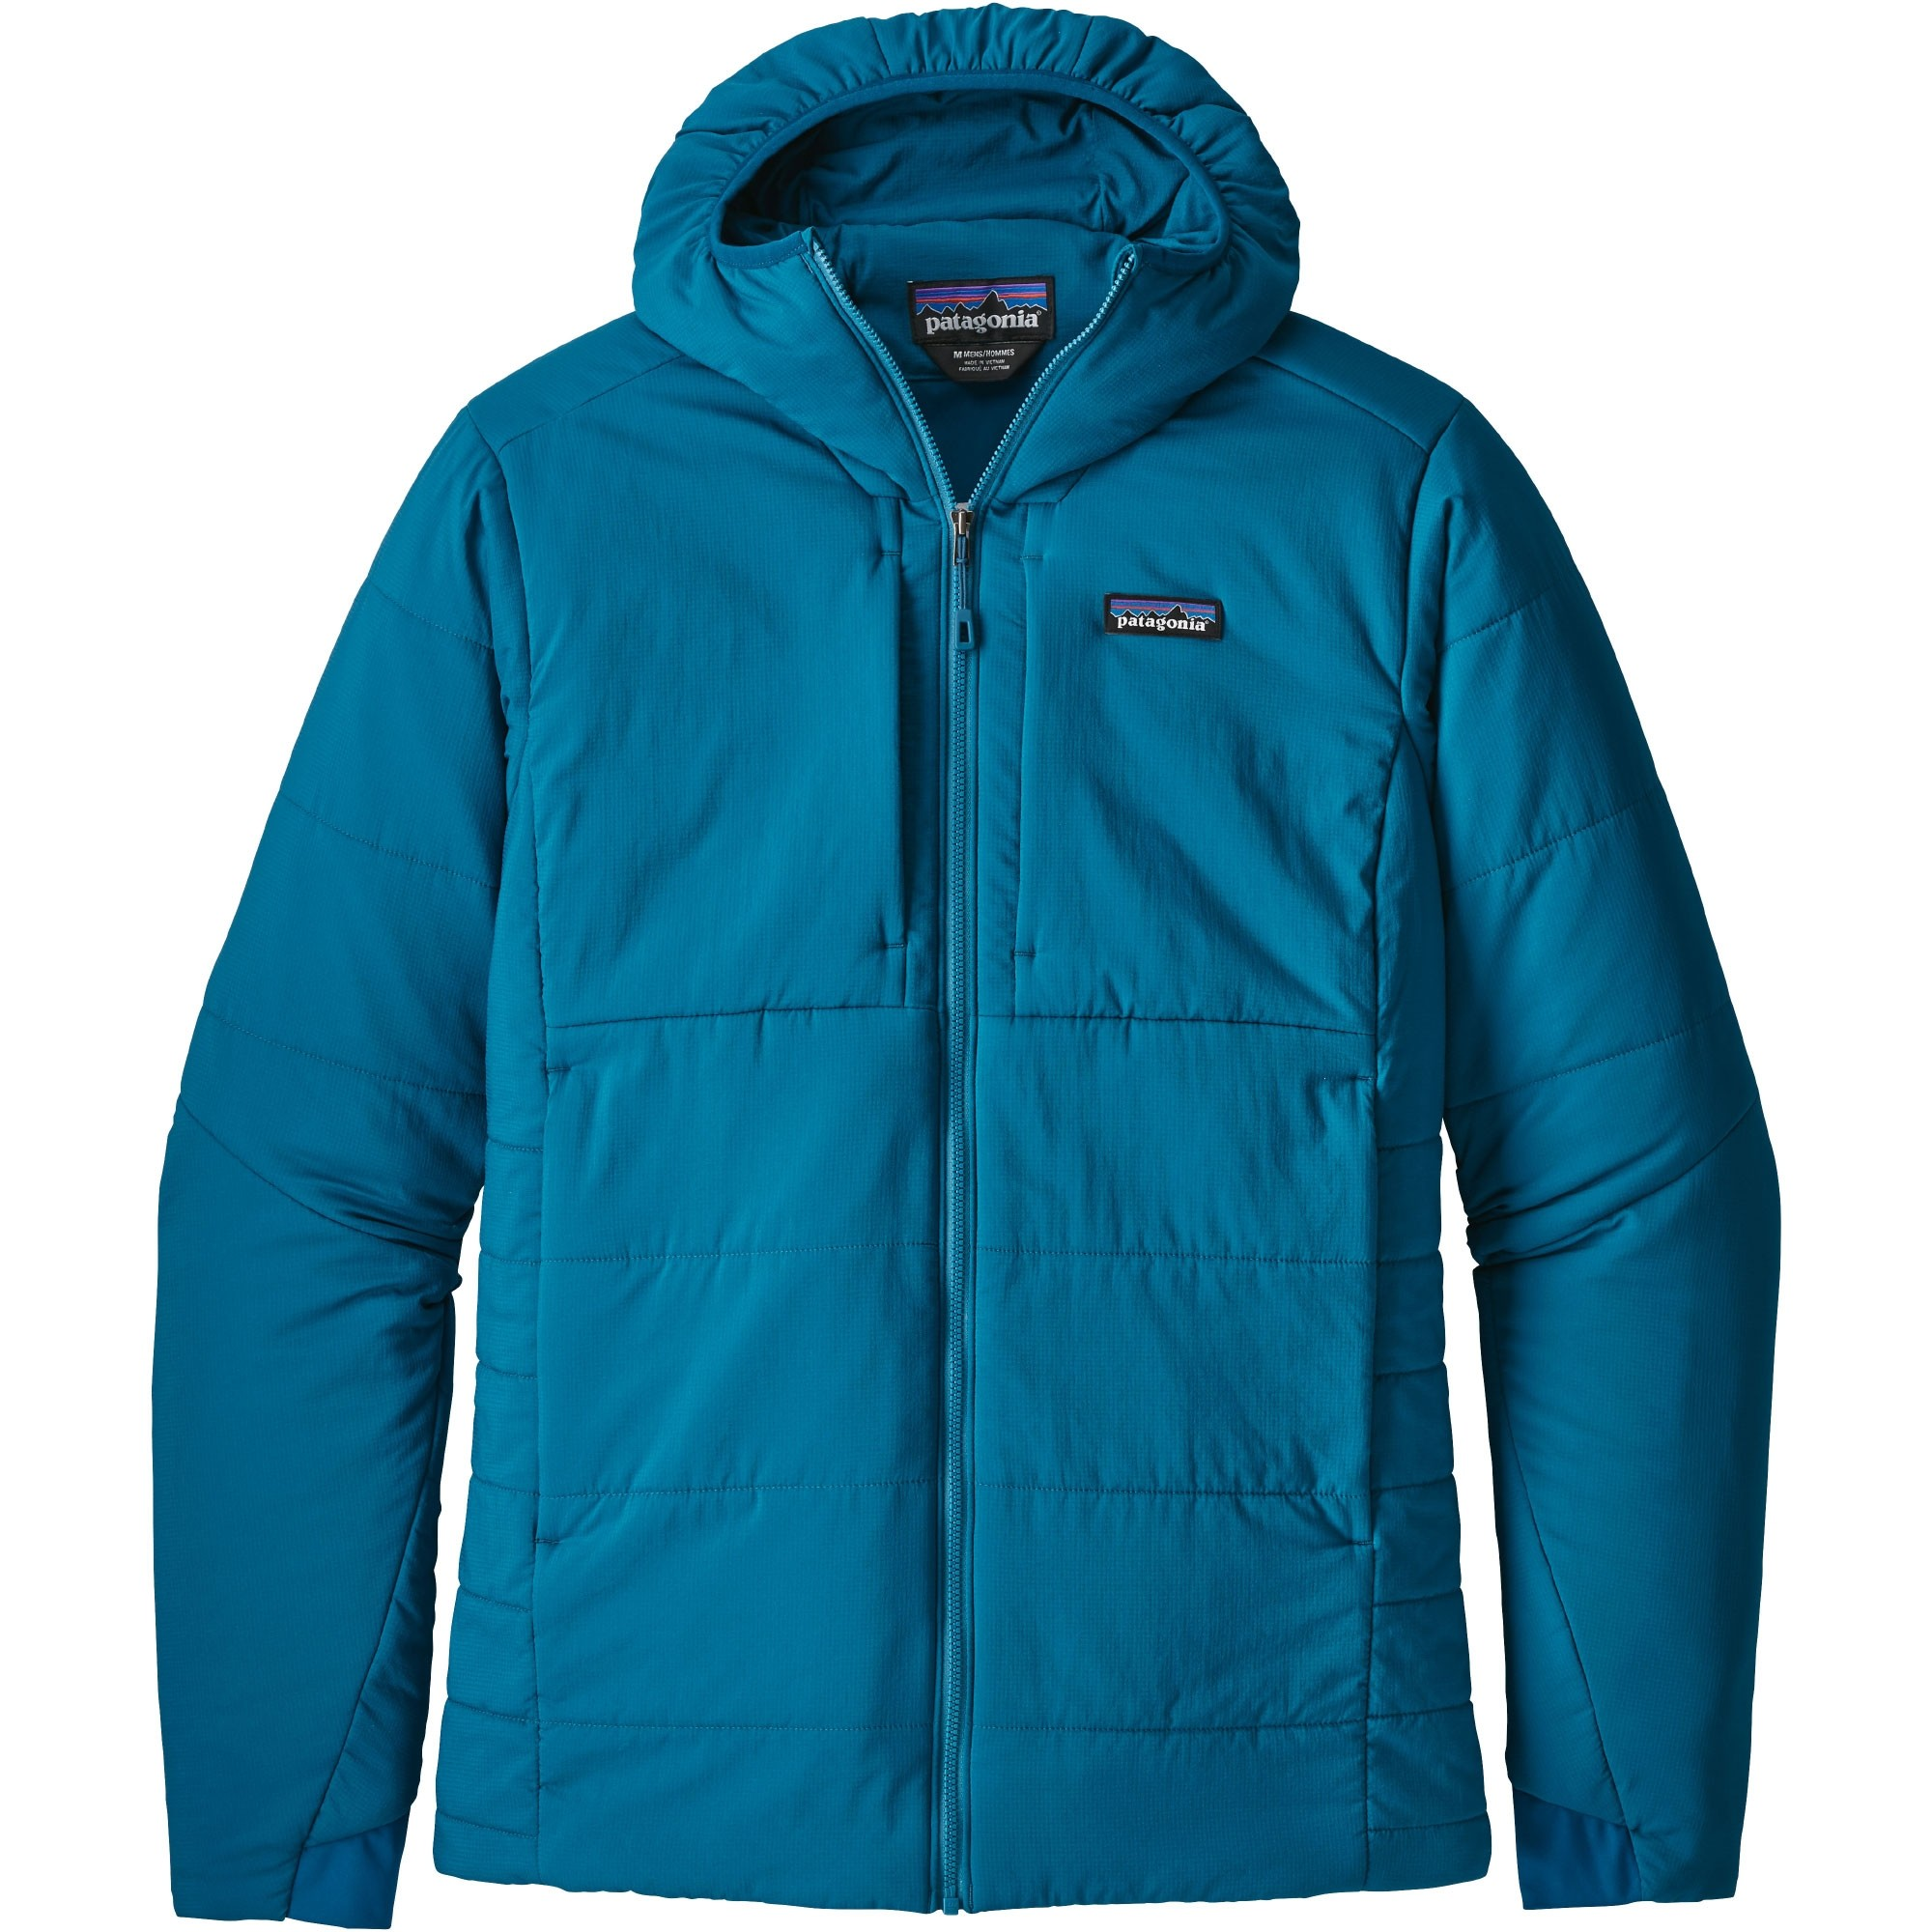 ... Patagonia Nano-Air Men s Hoody - Big Sur Blue ... 83477a042